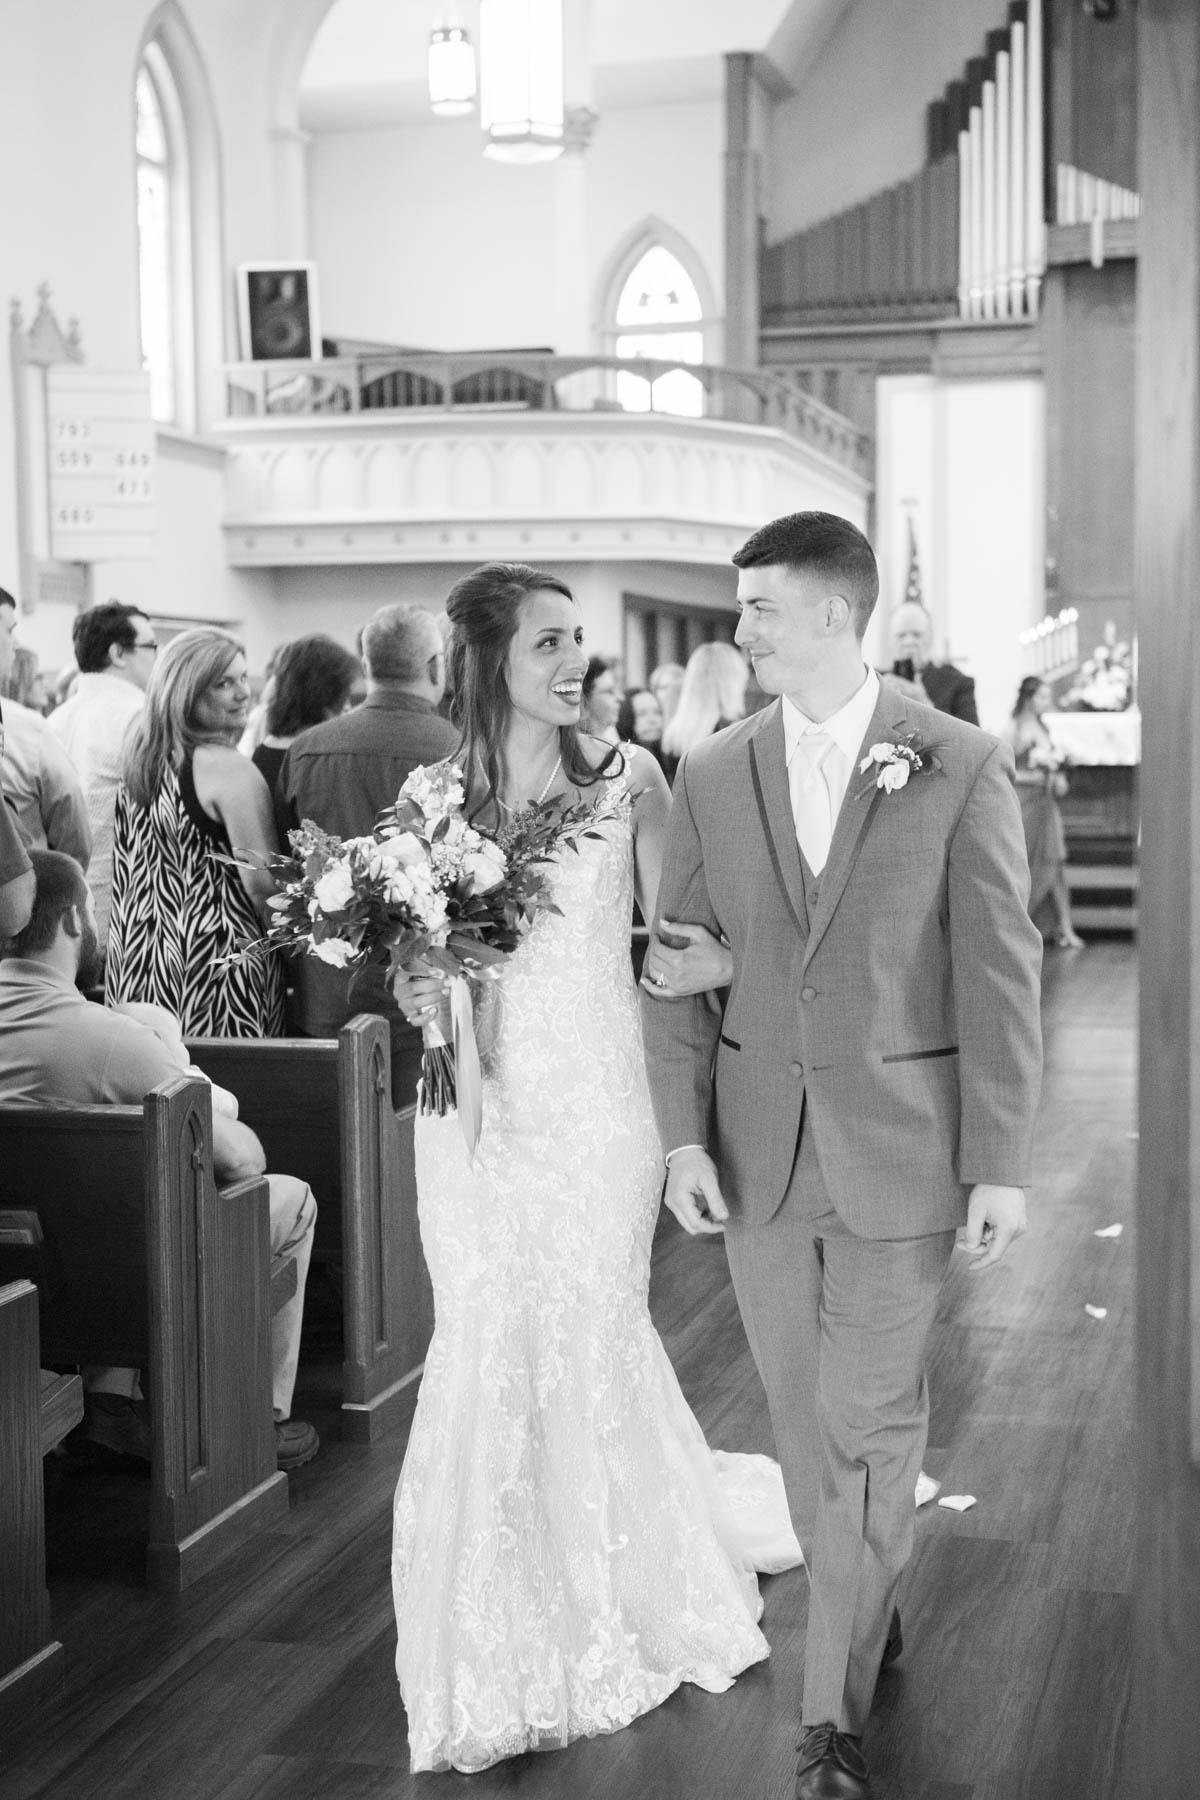 shotbychelsea_wedding_blog-19.jpg